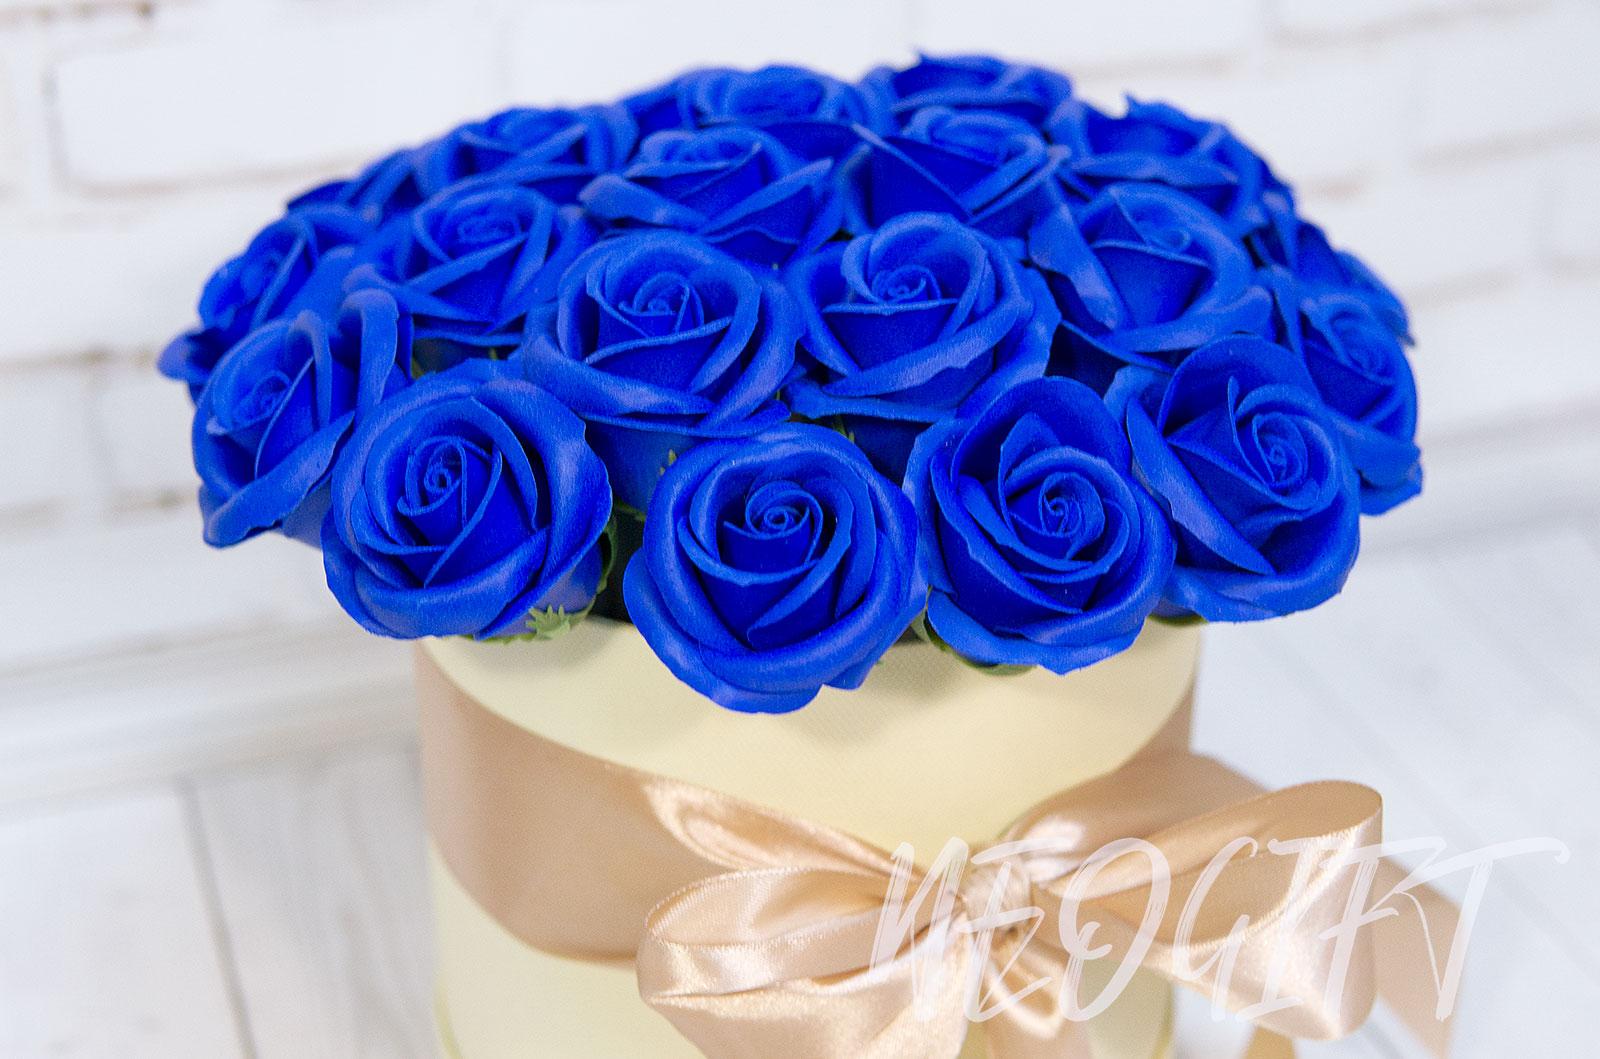 Стихах, открытки с синими розами